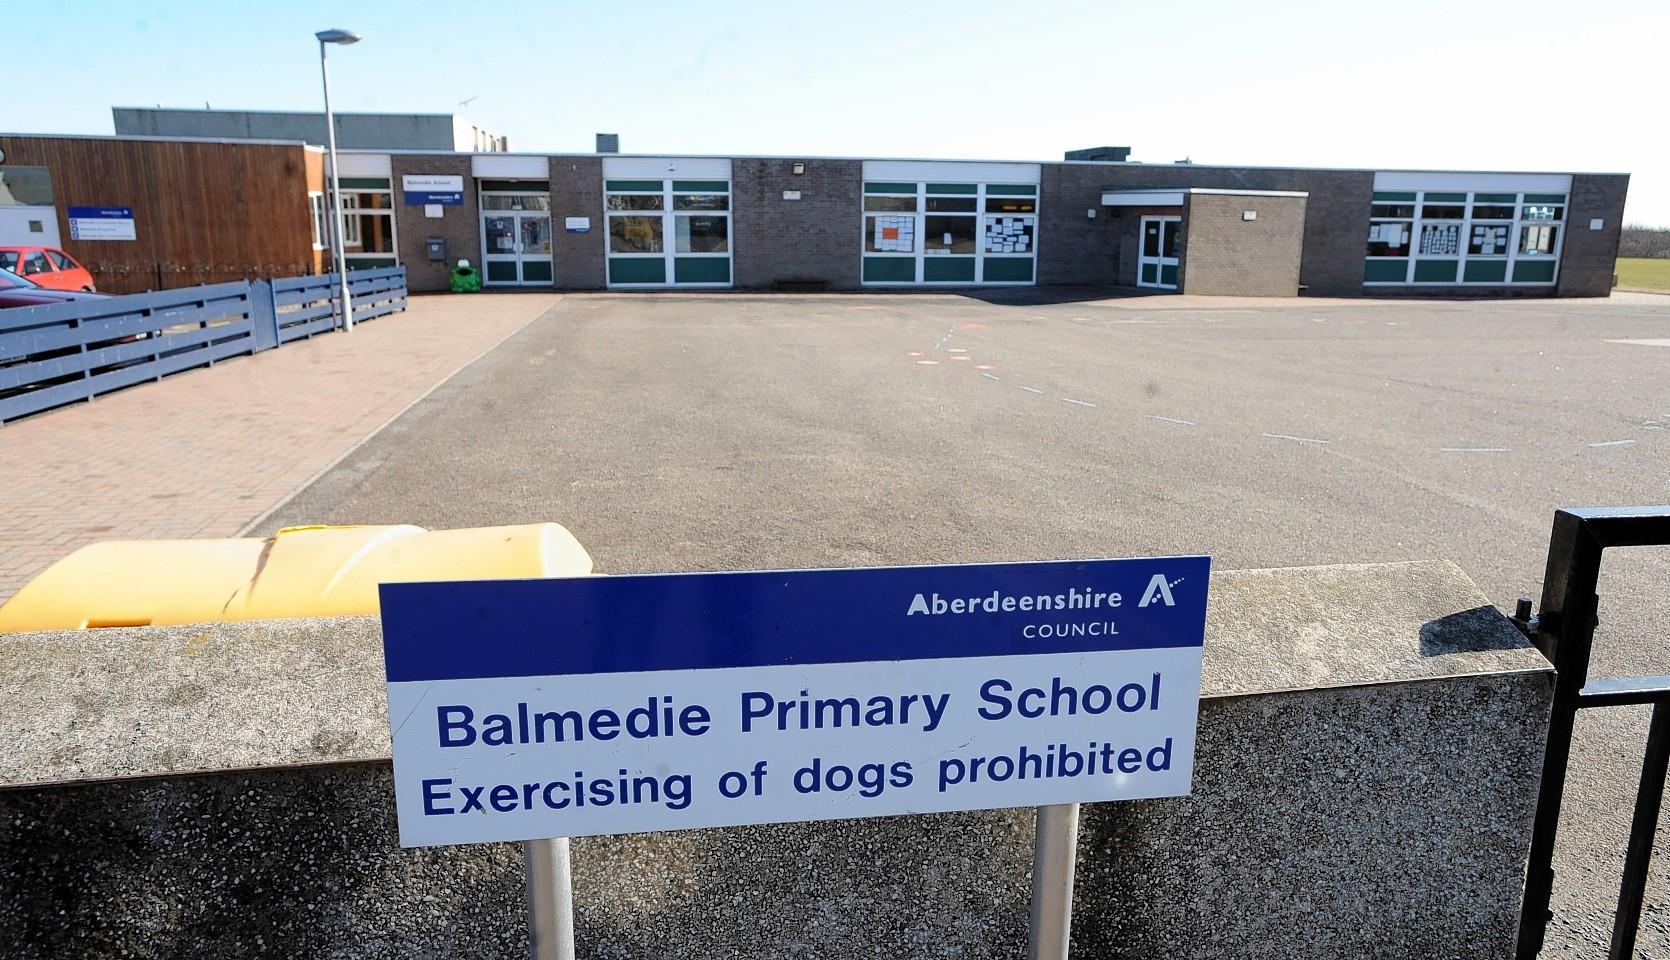 Balmedie Primary School